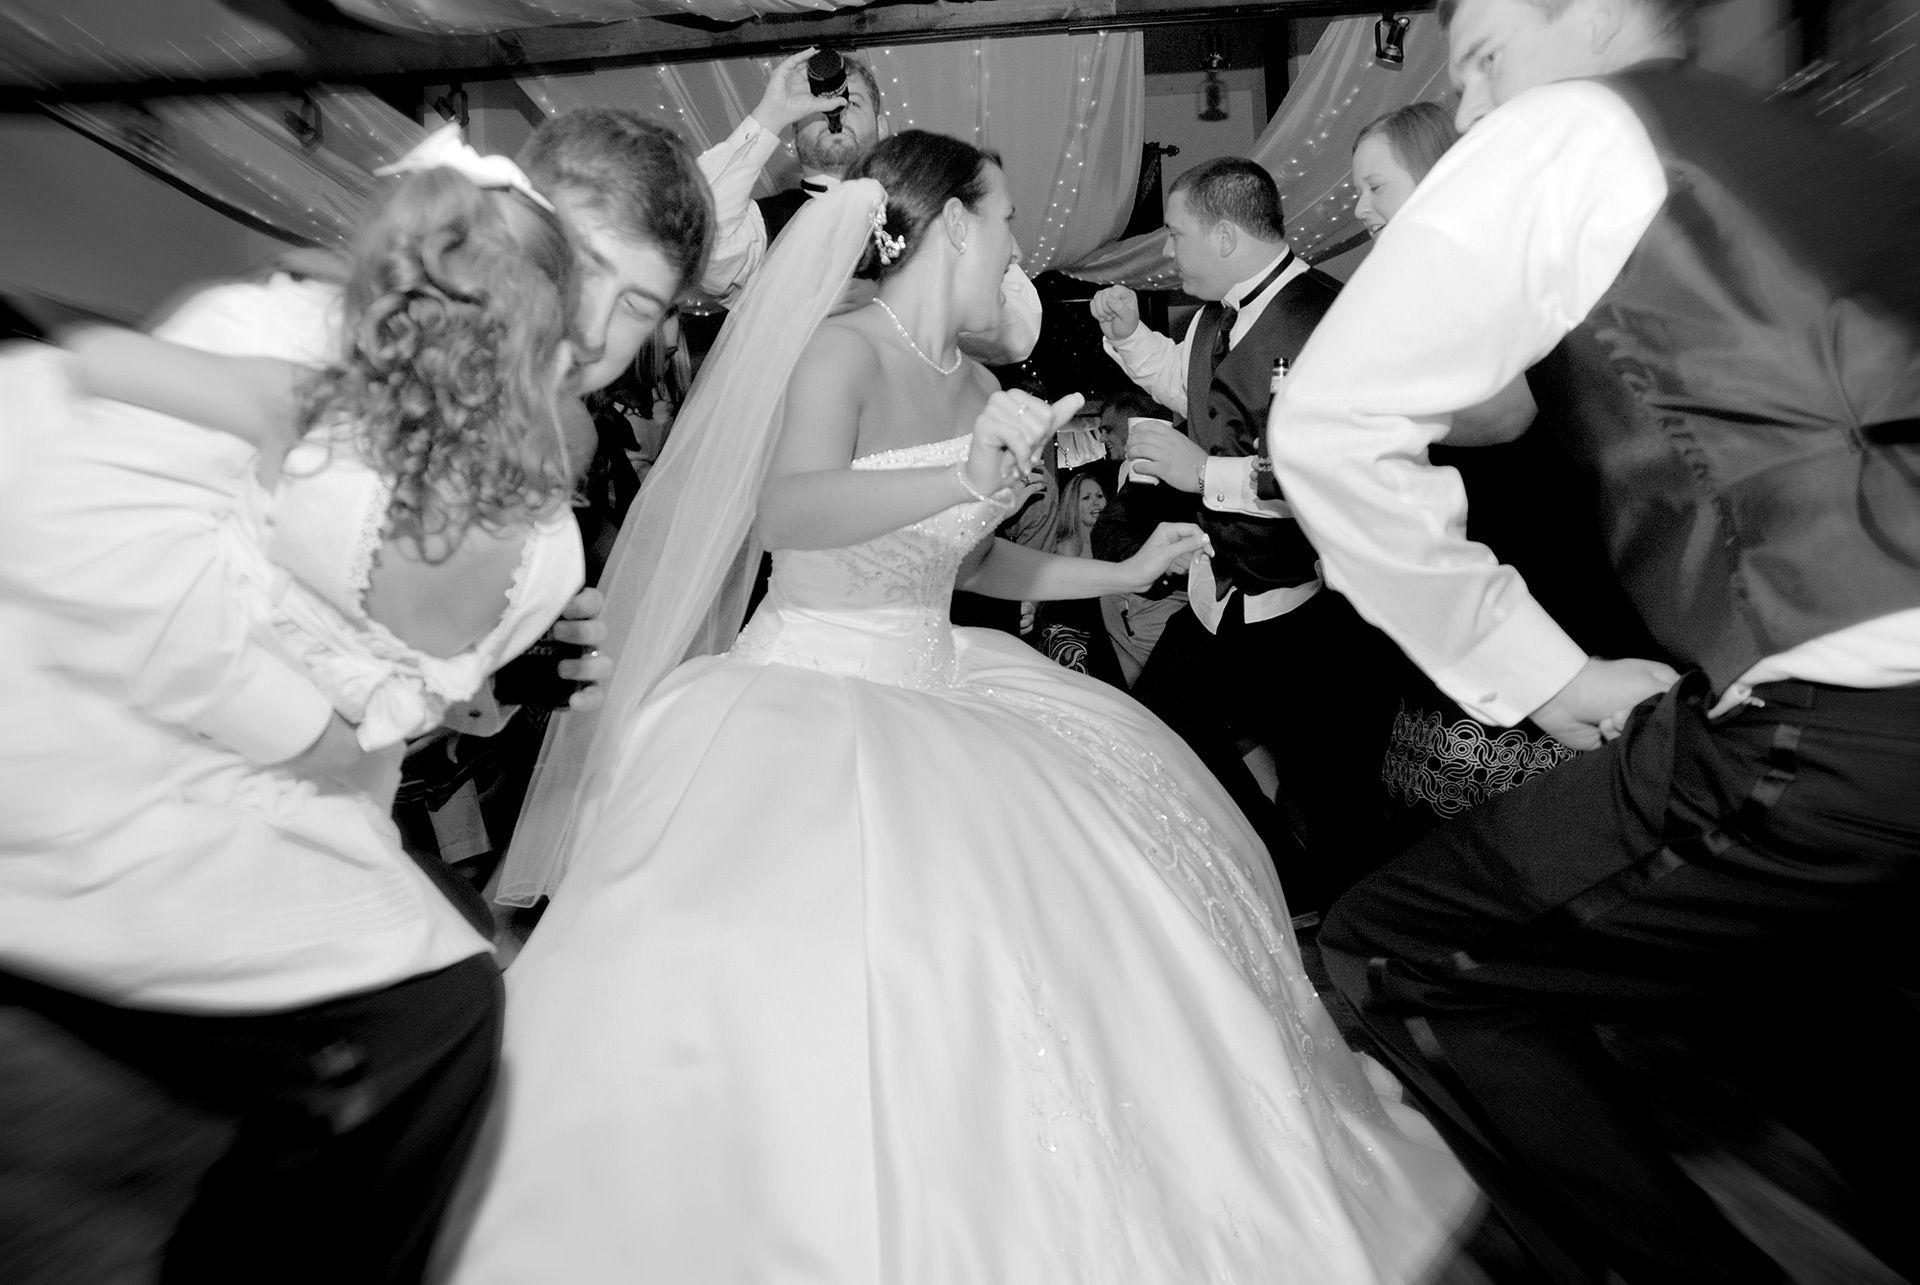 Wedding-Reception-Jig.jpg